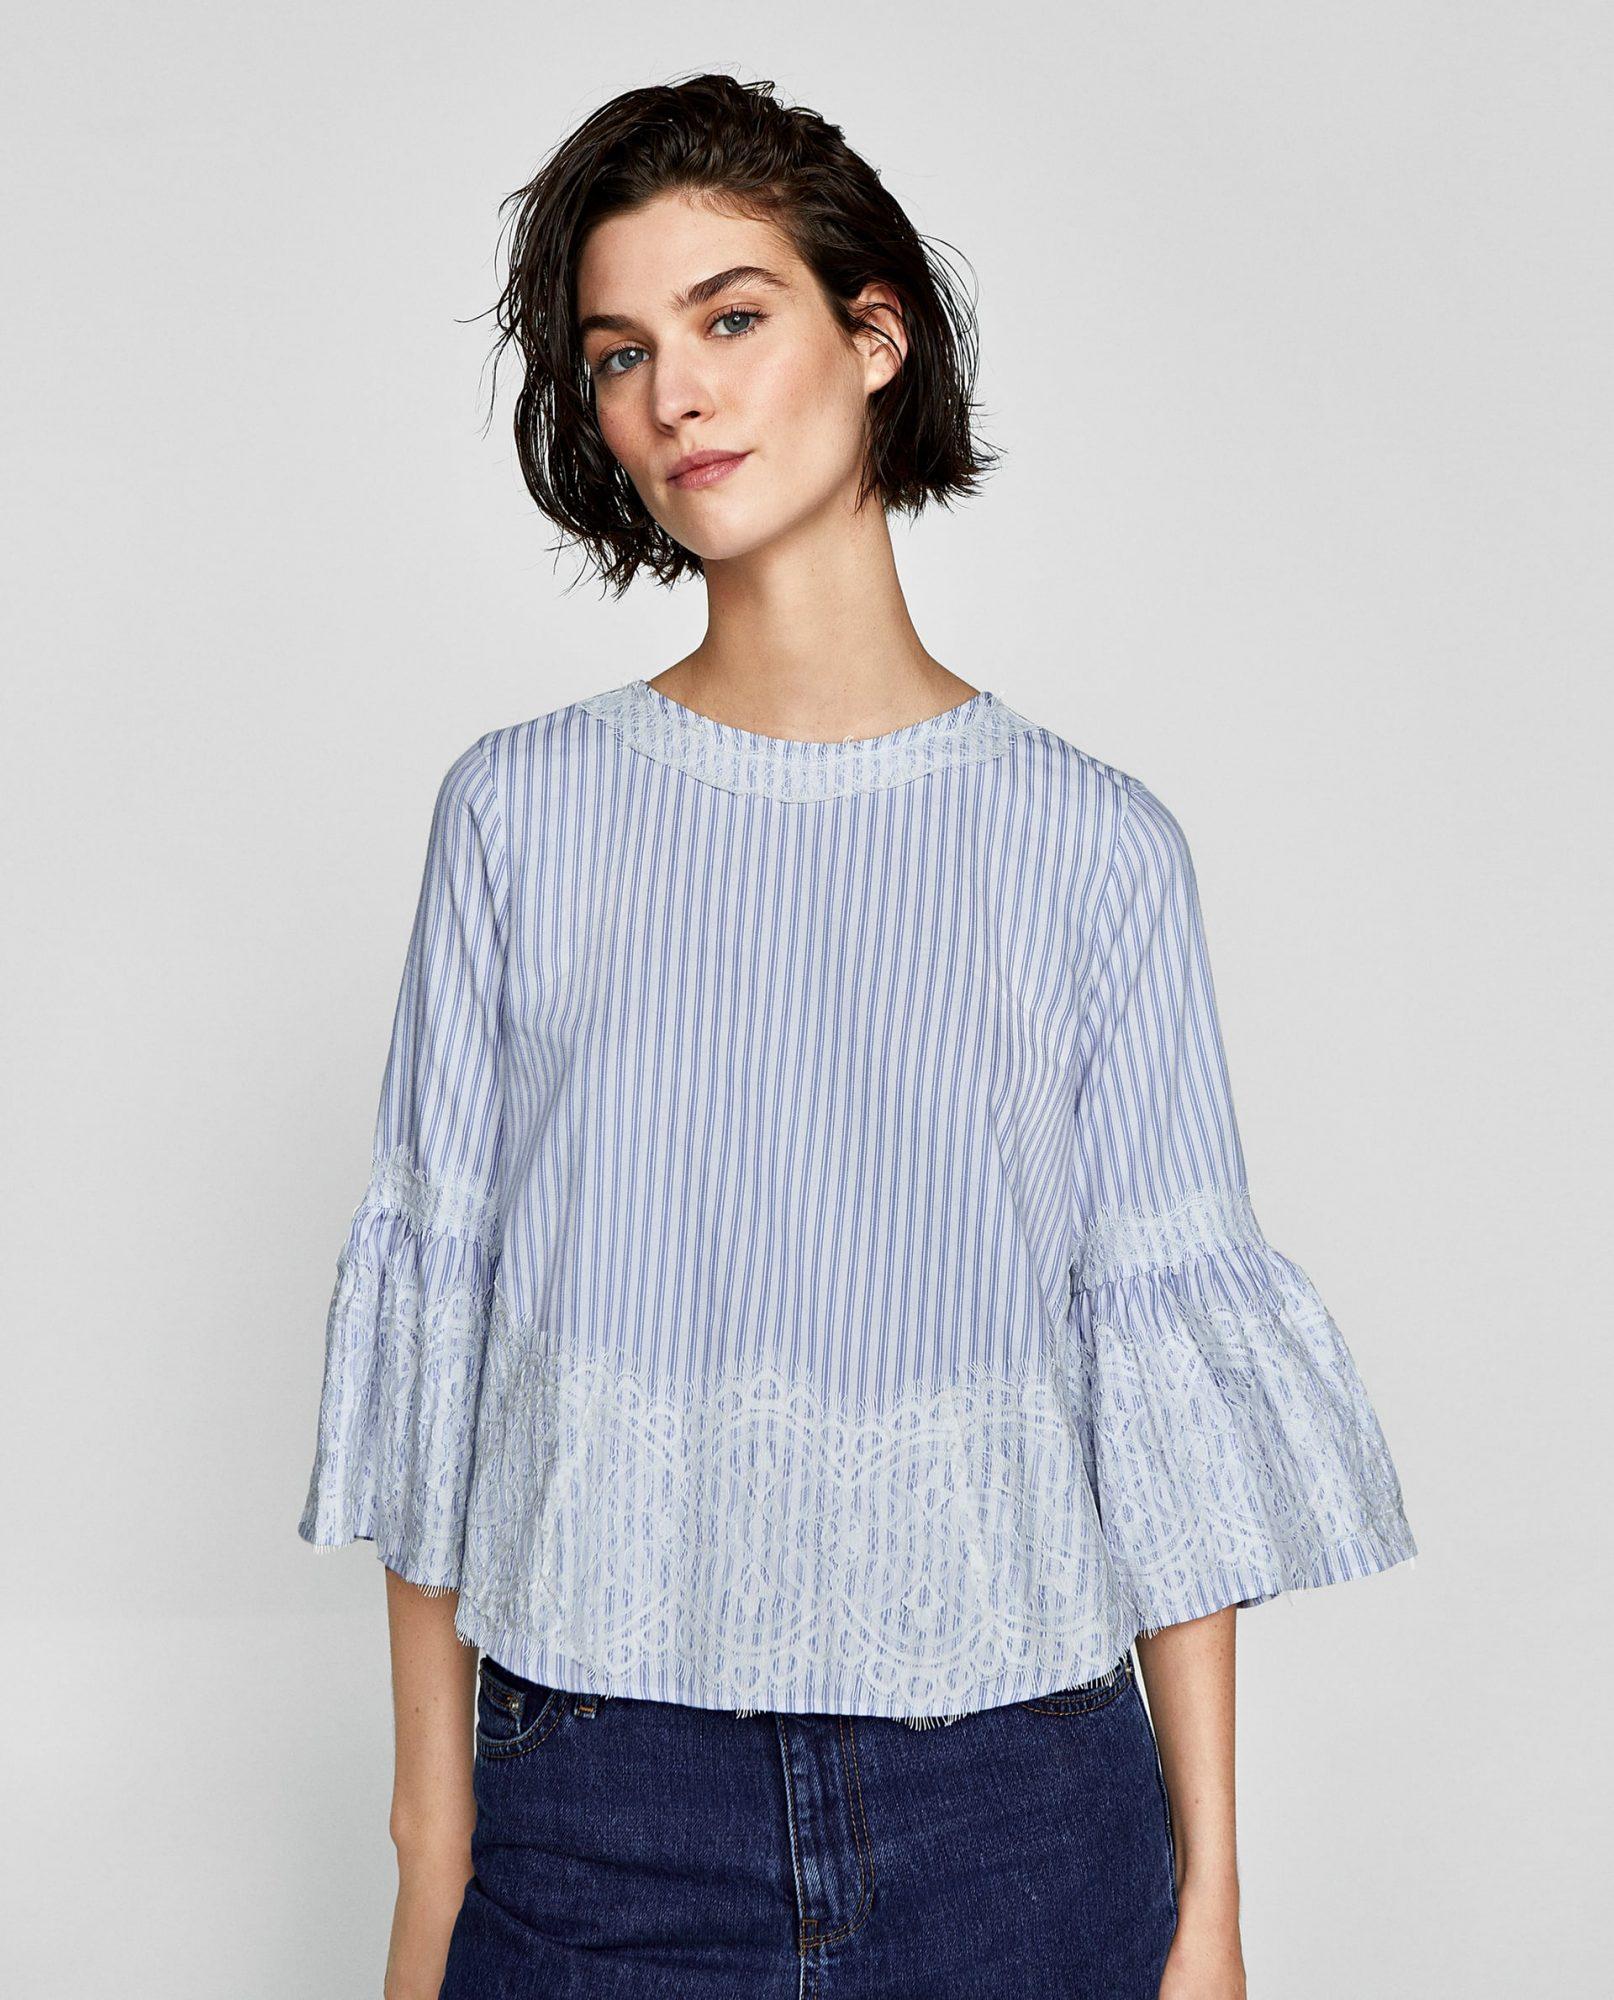 zara-lace-blouse.jpg